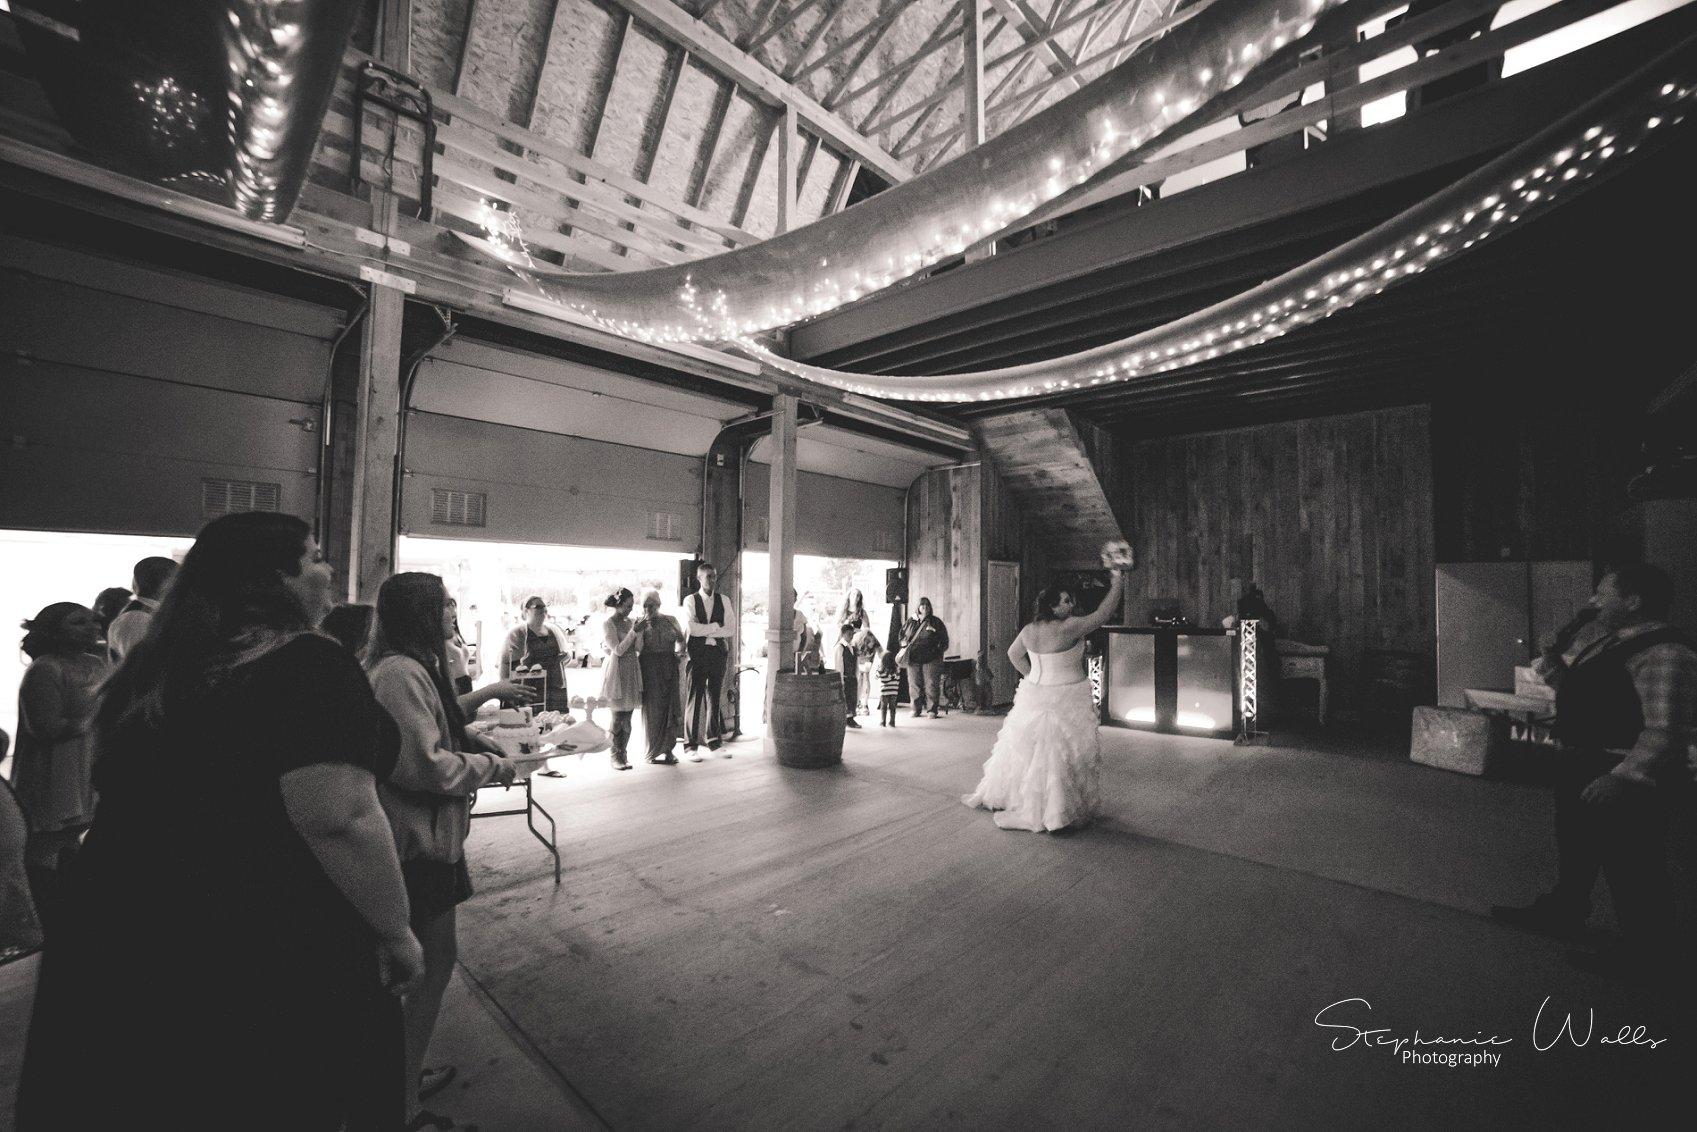 Kimble Wedding 098 Marlena & Allans | Snohomish Red Barn Events (Stocker Farms) | Snohomish, Wa Wedding Photographer